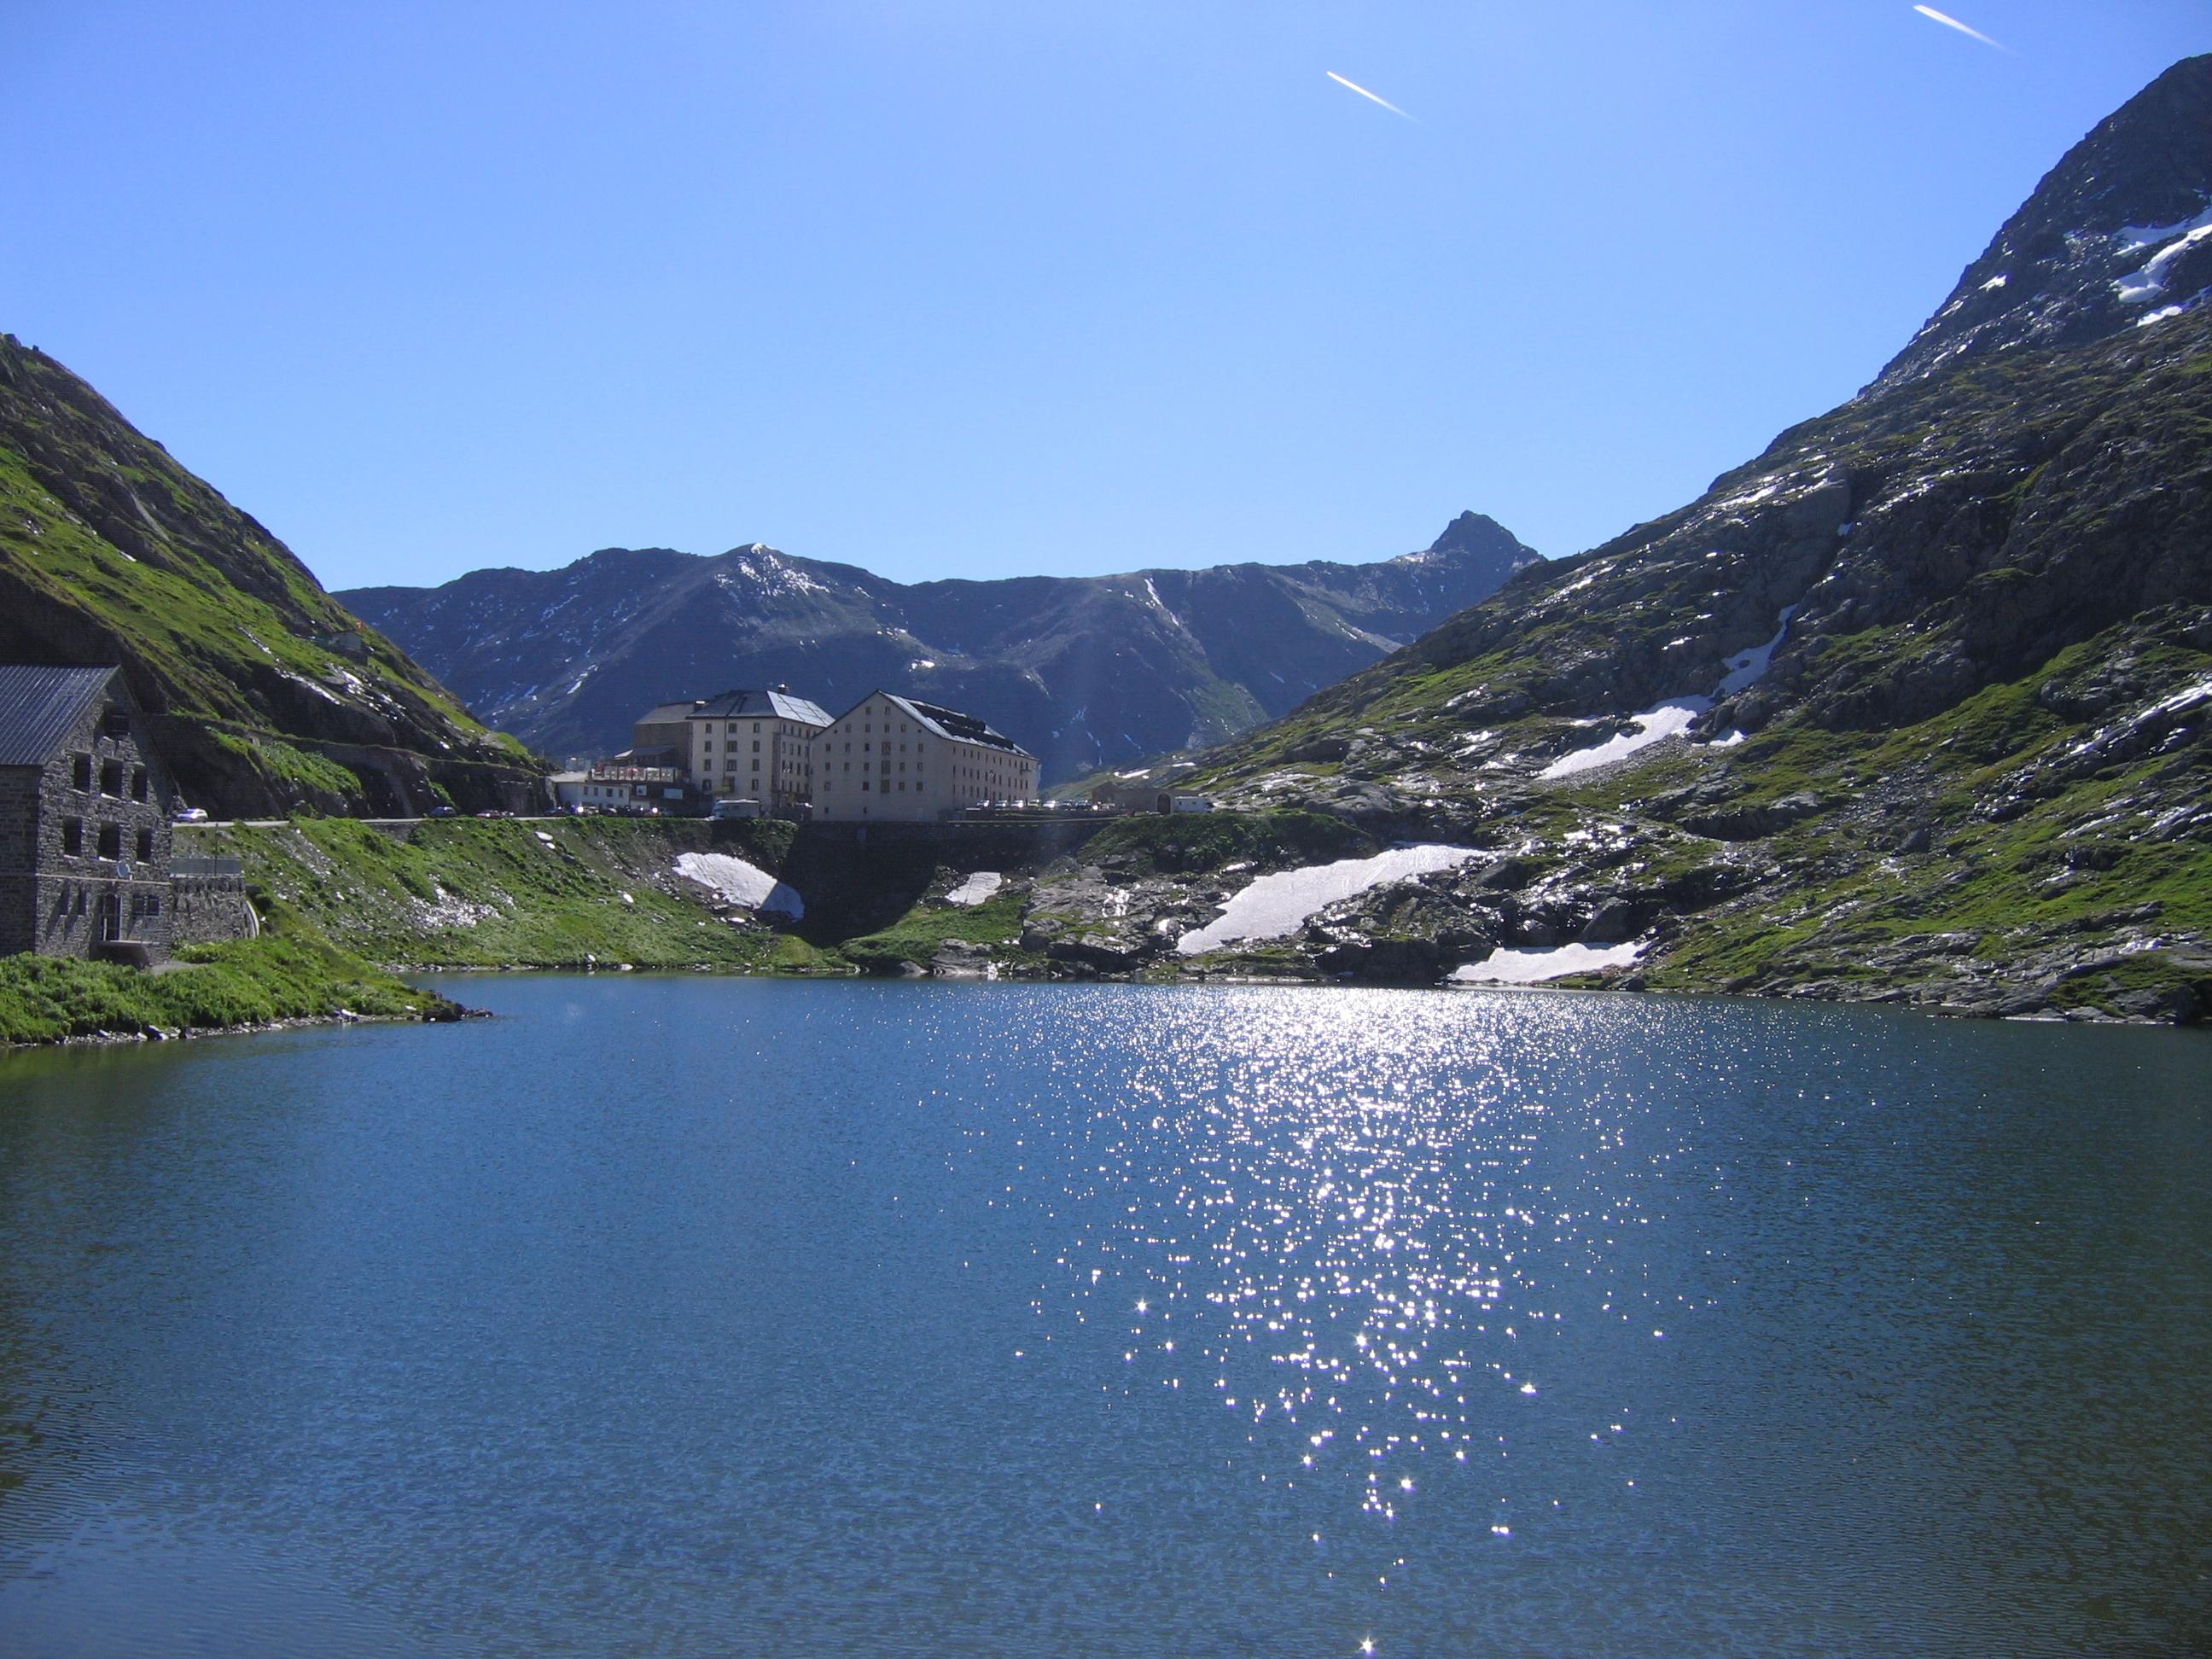 L'hospice du Grand-Saint-Bernard